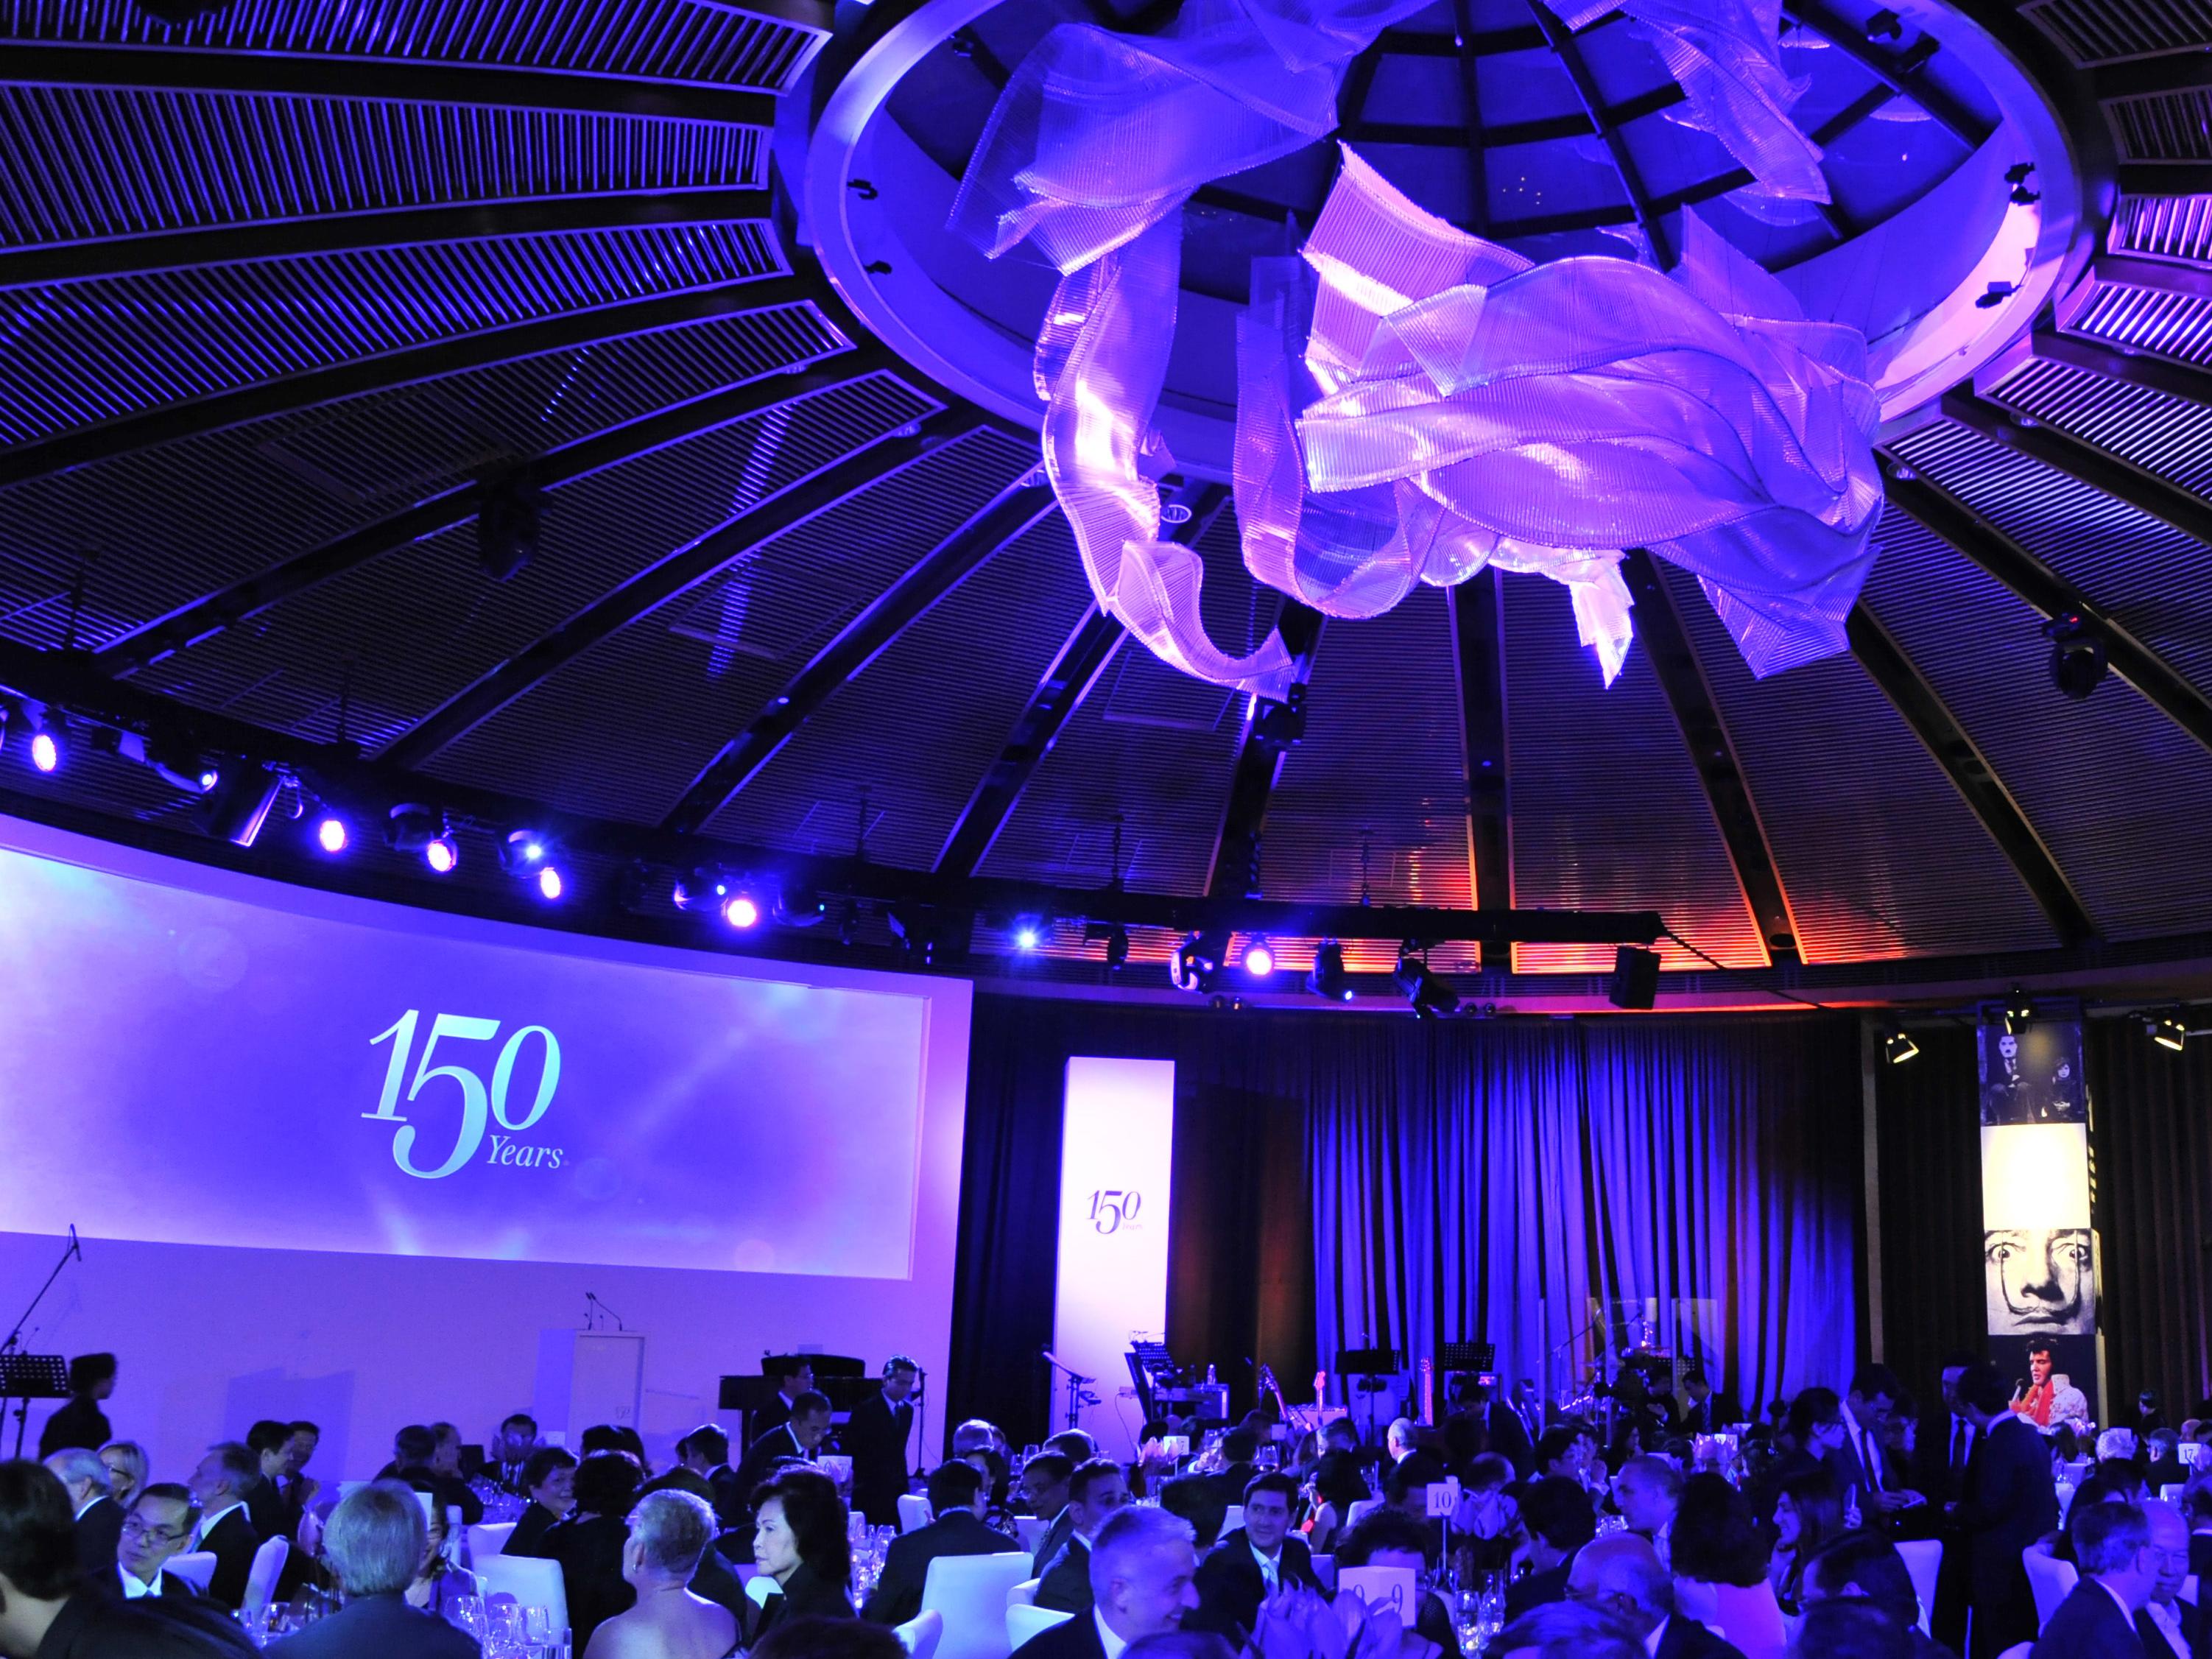 UBS 150 Jahre Jubiläum Singapur